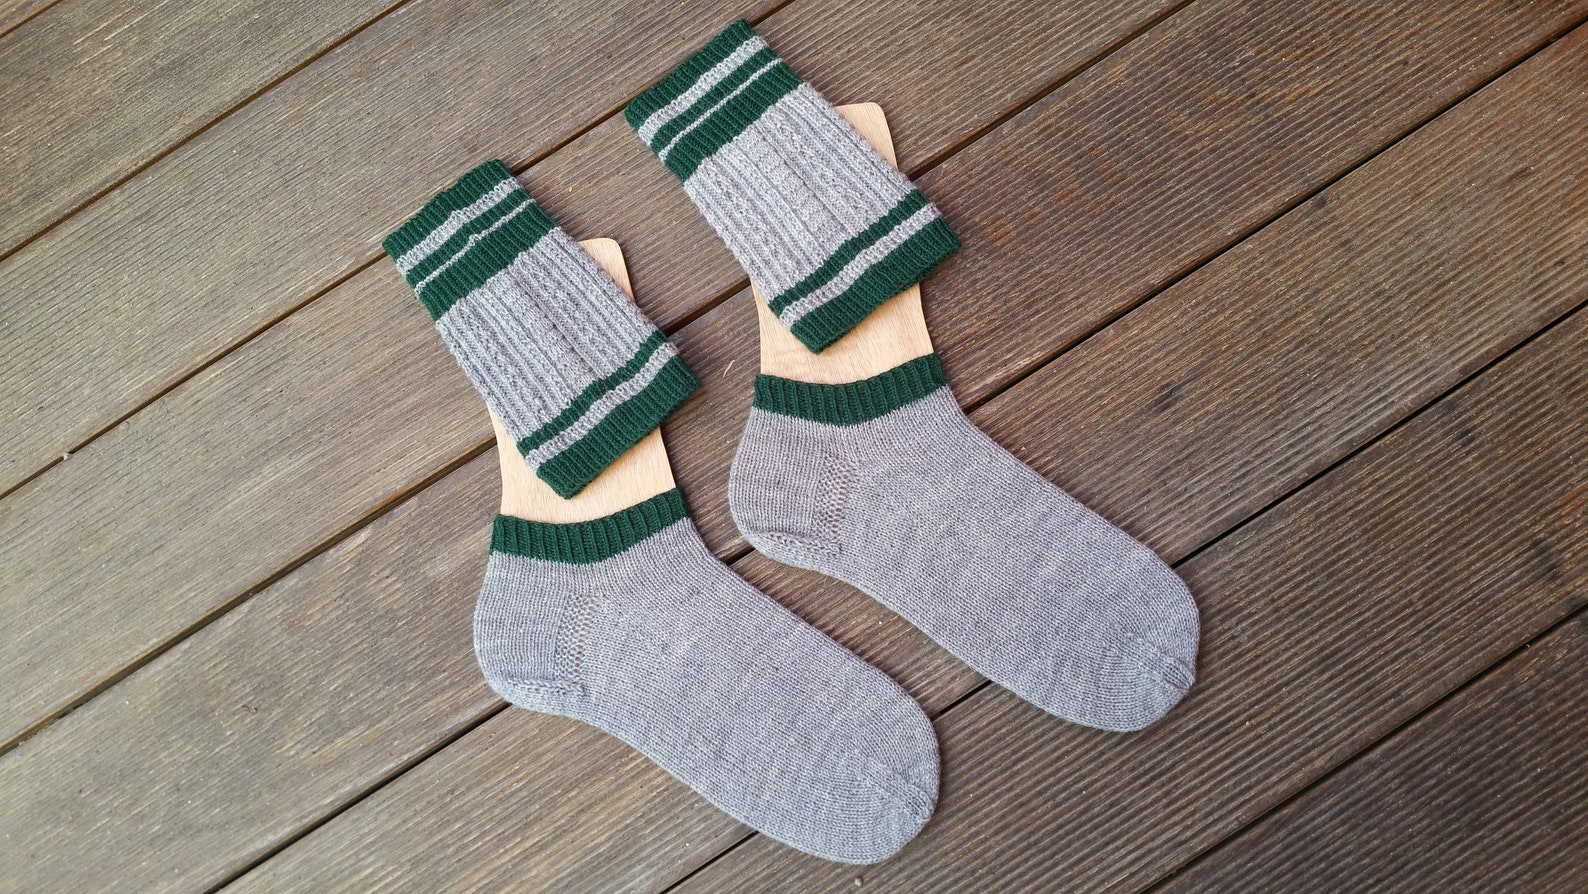 Handknitted socks Wool socks with calf warmers Loferl Men's cable pattern light gray dark blue Size EU 40/41 - US 8,5-9,5 - UK 6,5-7,5